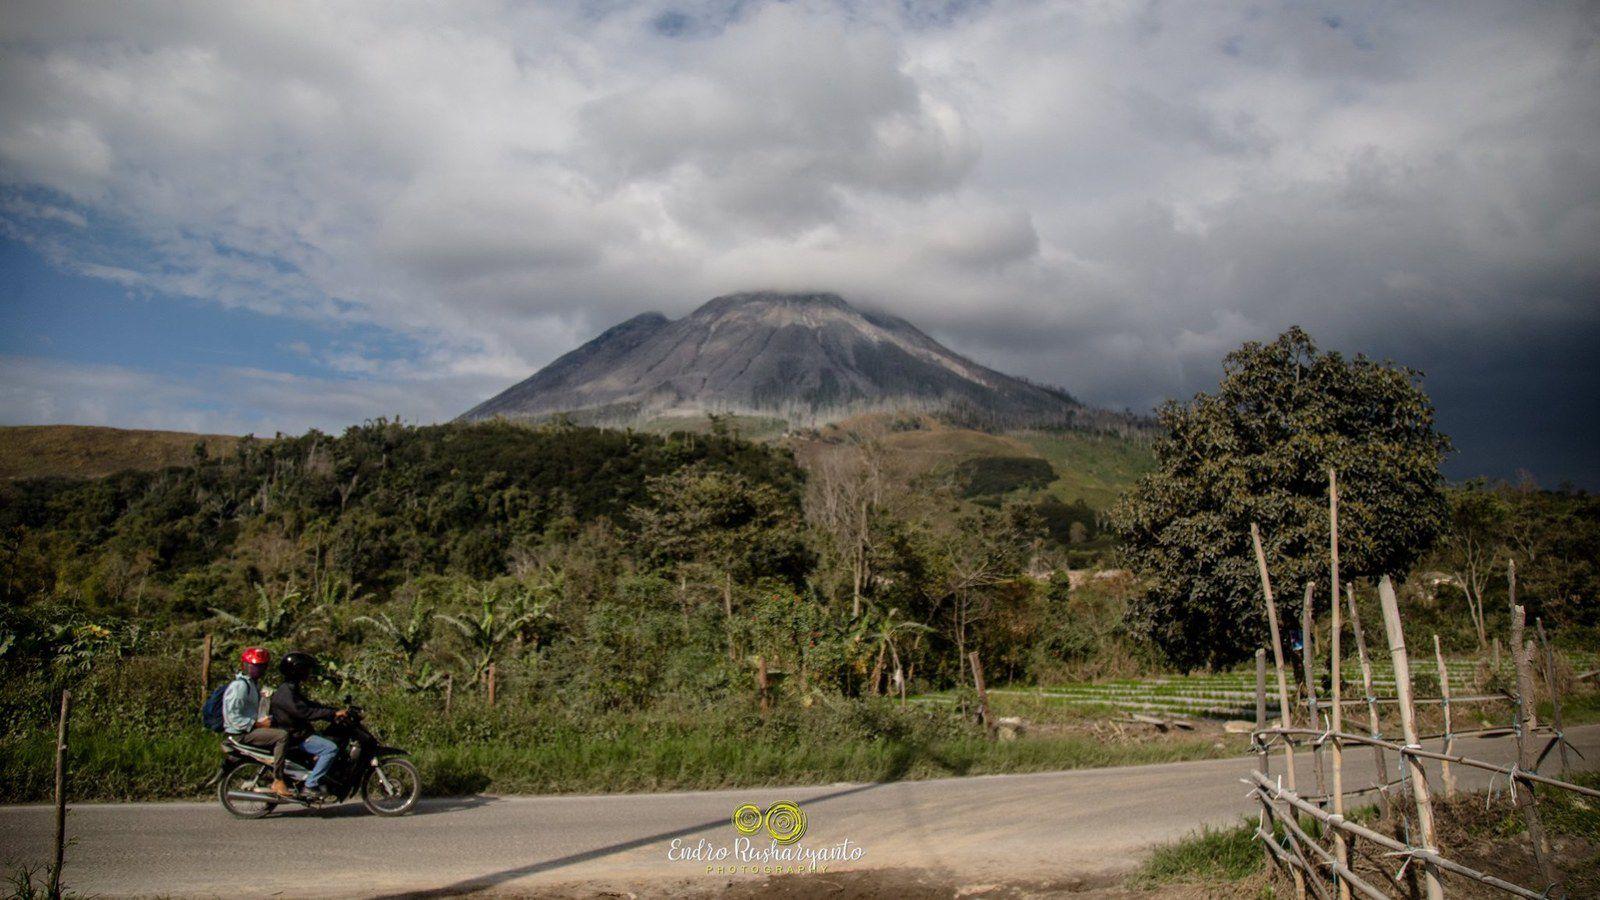 Sinabung - photo via Awel Ordne 08/16/2020